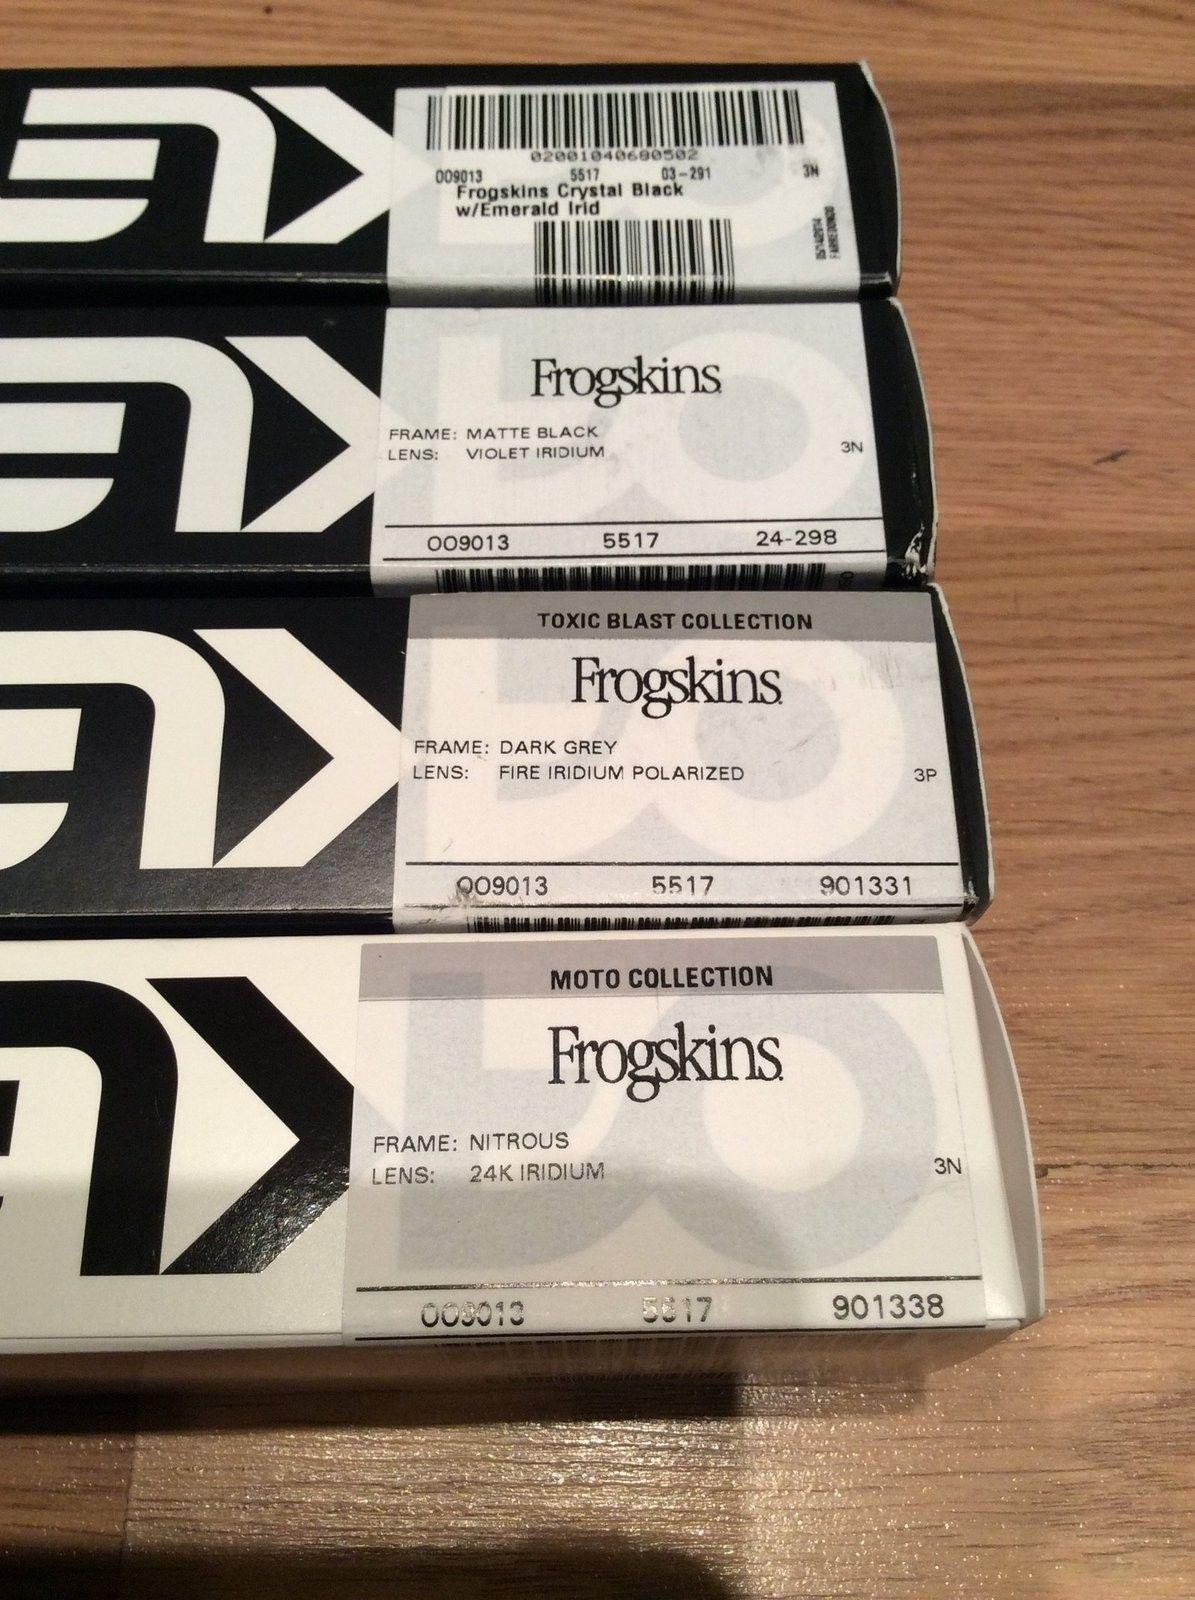 BNIB Frogskins (4) $180 shipped - image.jpg